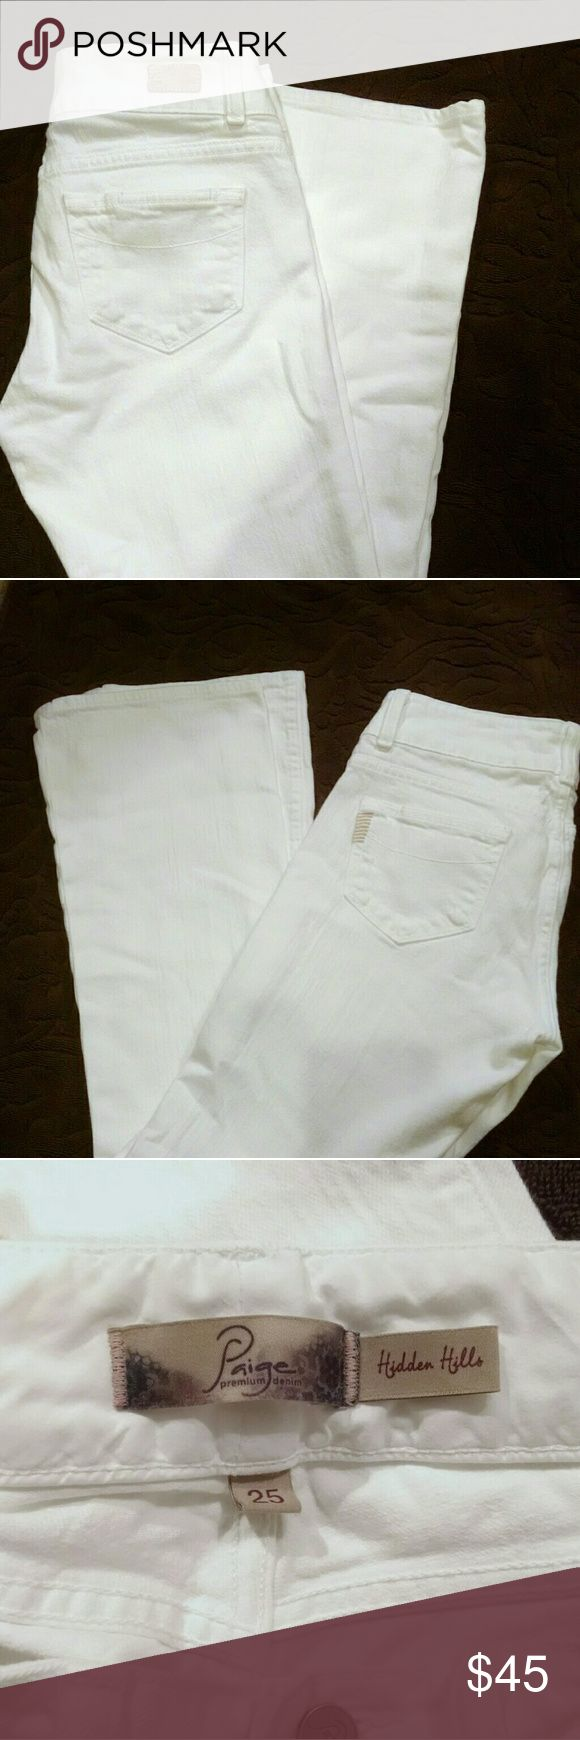 "NWOT Paige Jean Hidden Hills, 25 Brand New, adorable white Hidden Hills Paige Jeans, 27"" waist, 8"" rise, 29"" inseam, size 25. NWOT Paige Jeans Jeans"